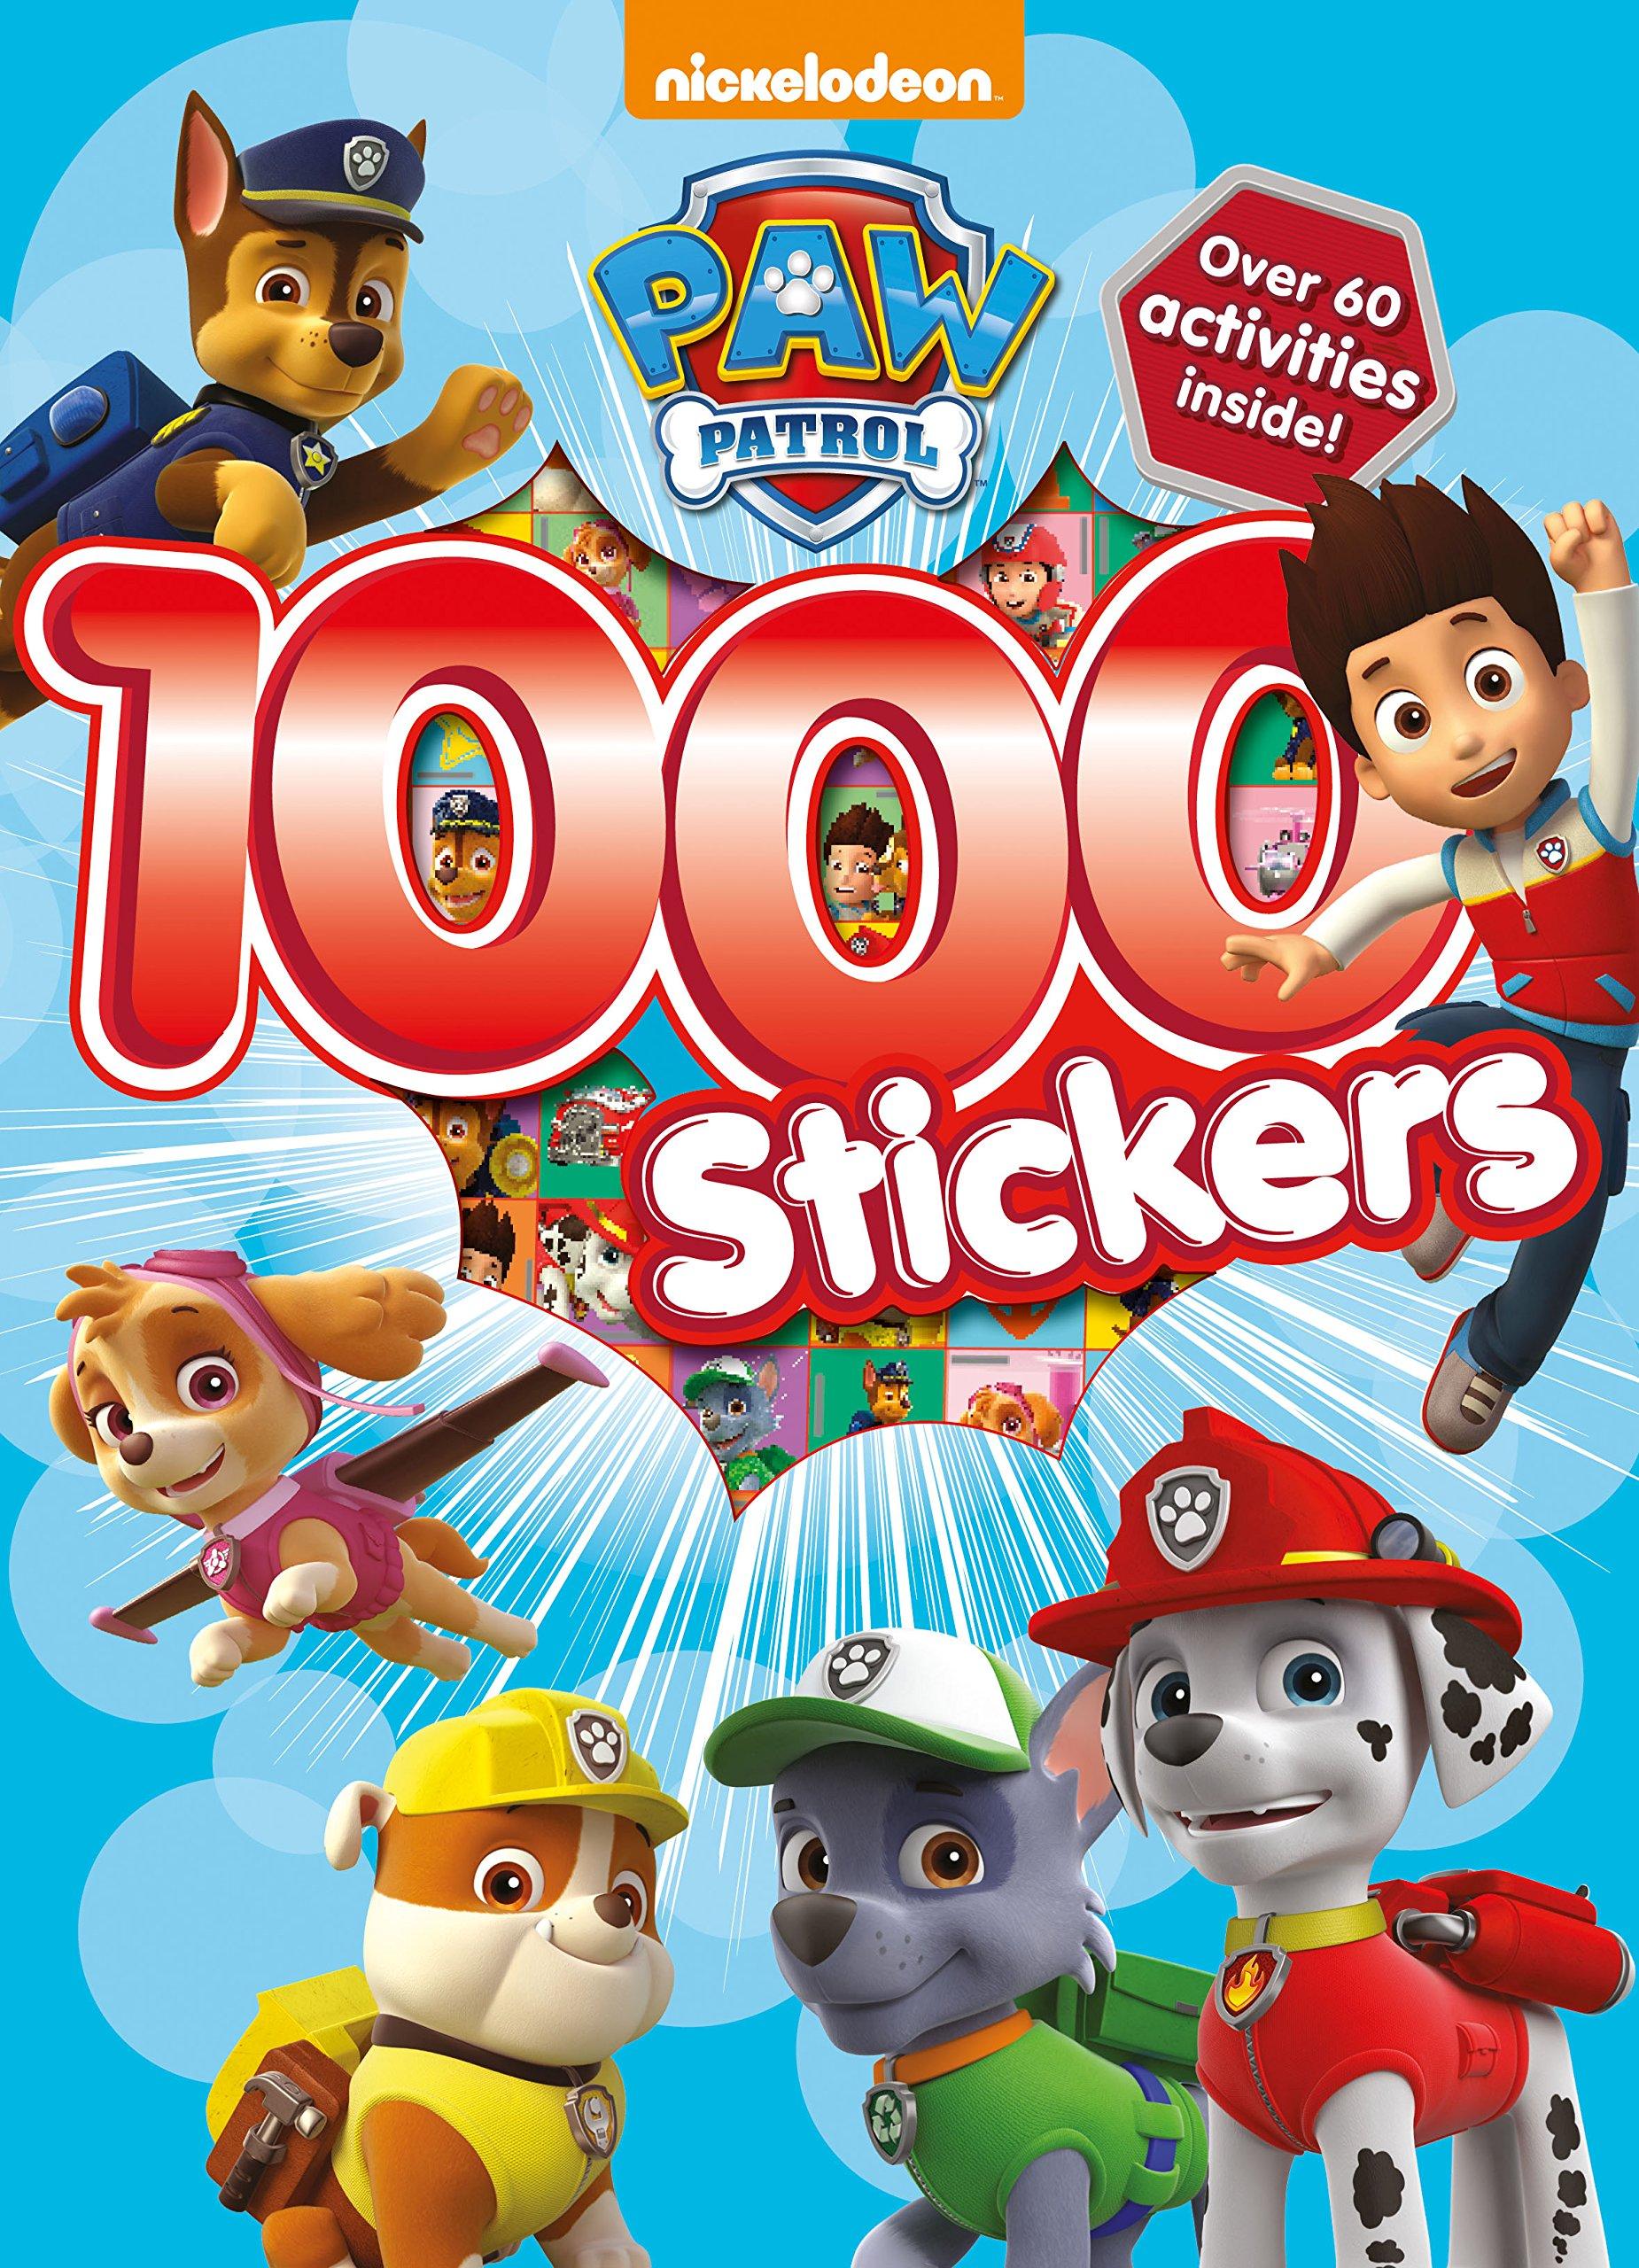 Nickelodeon Paw Patrol 1000 Stickers Parragon